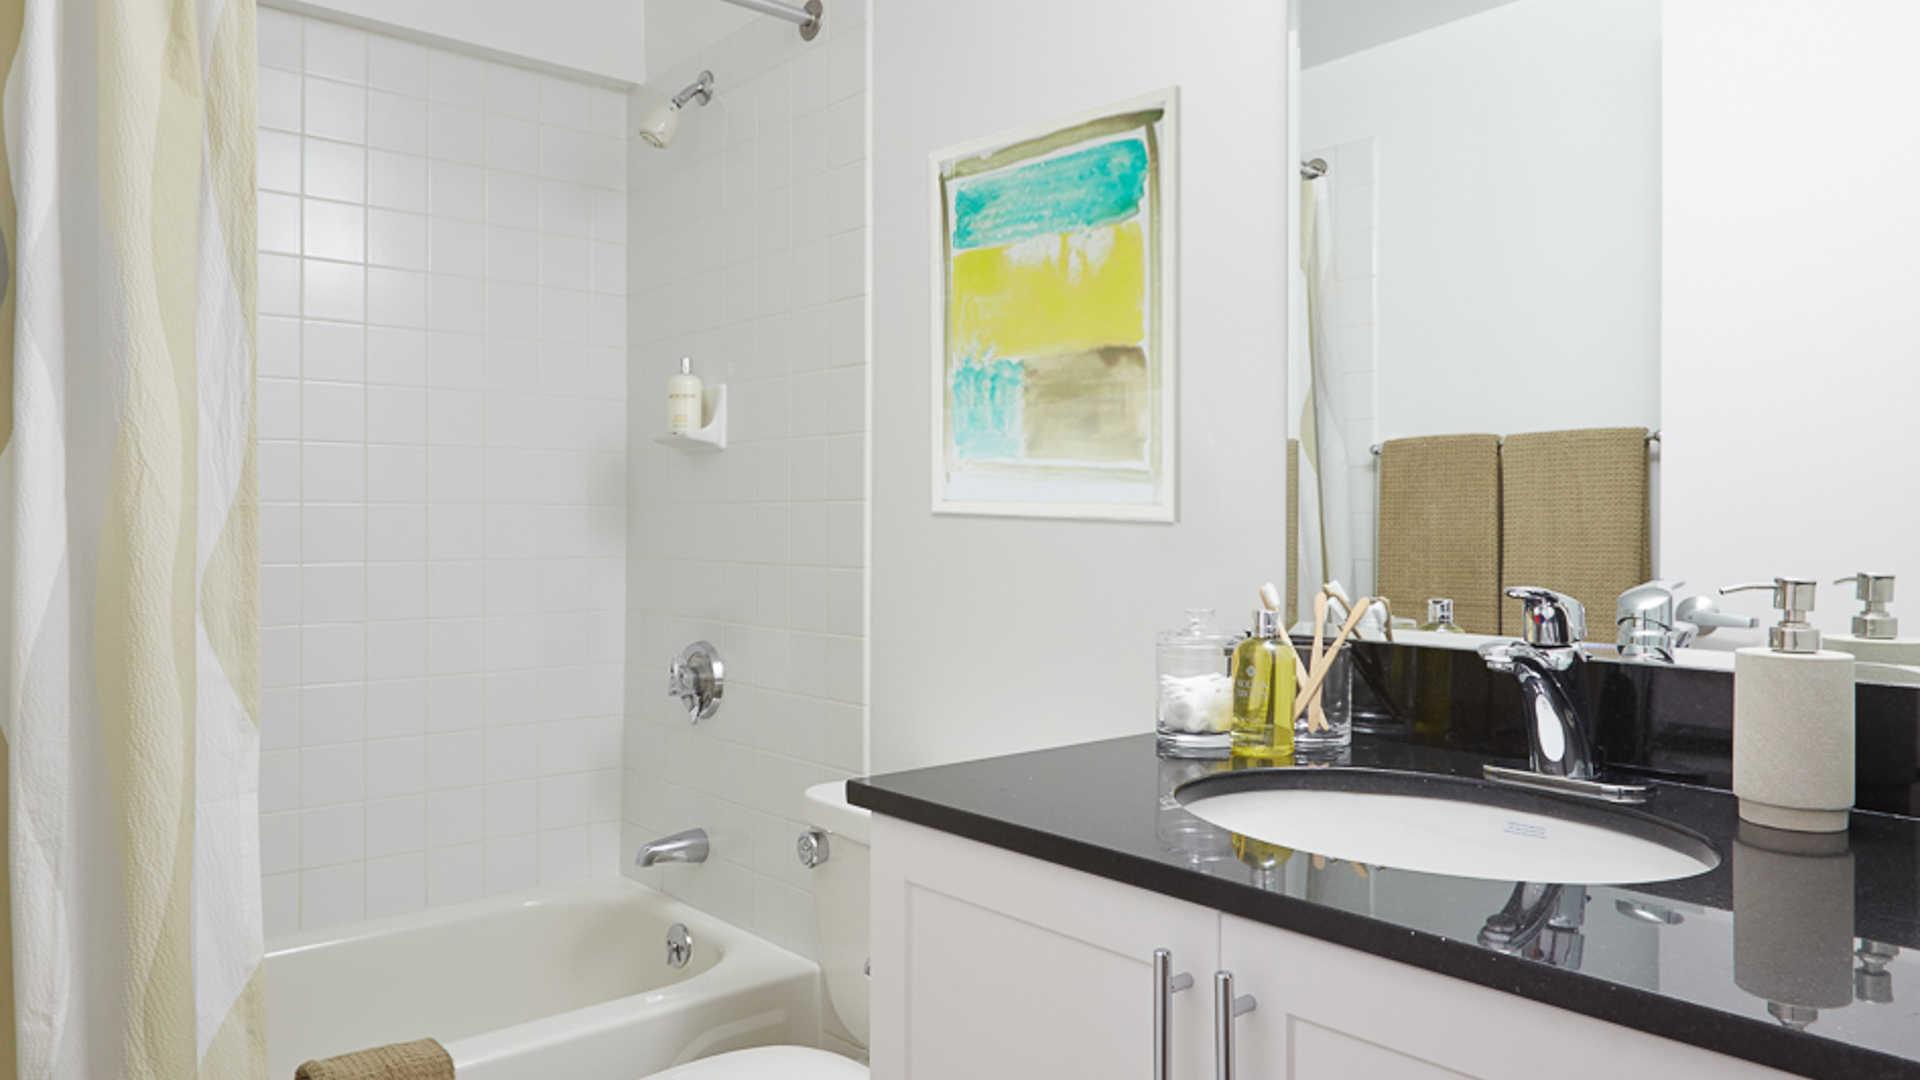 Lofts at kendall square apartments bathroom